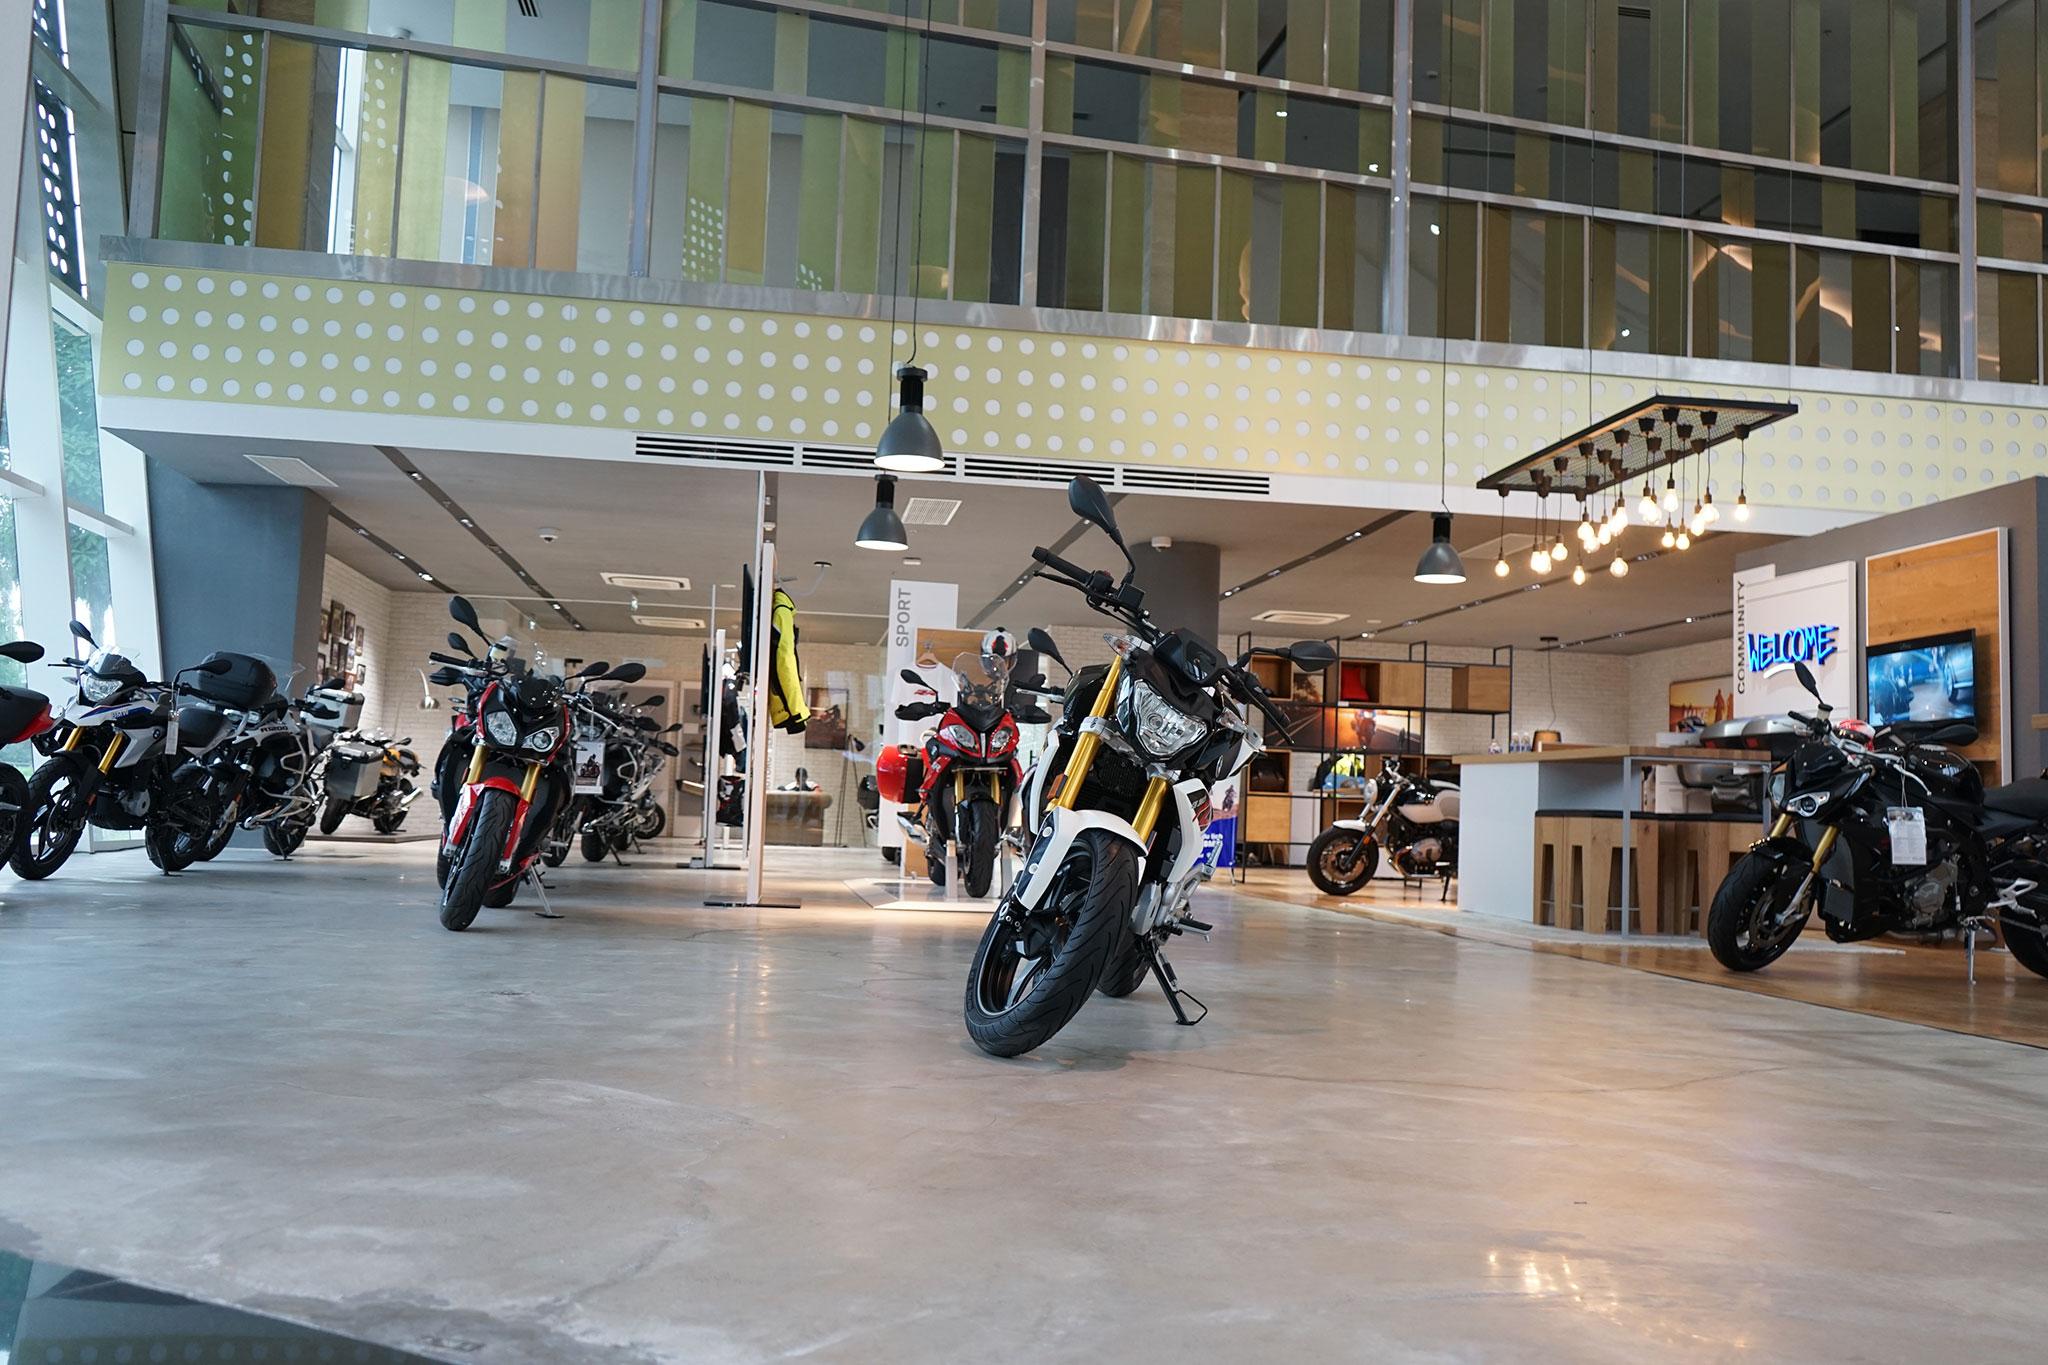 showroom-toan-cau-03.jpg